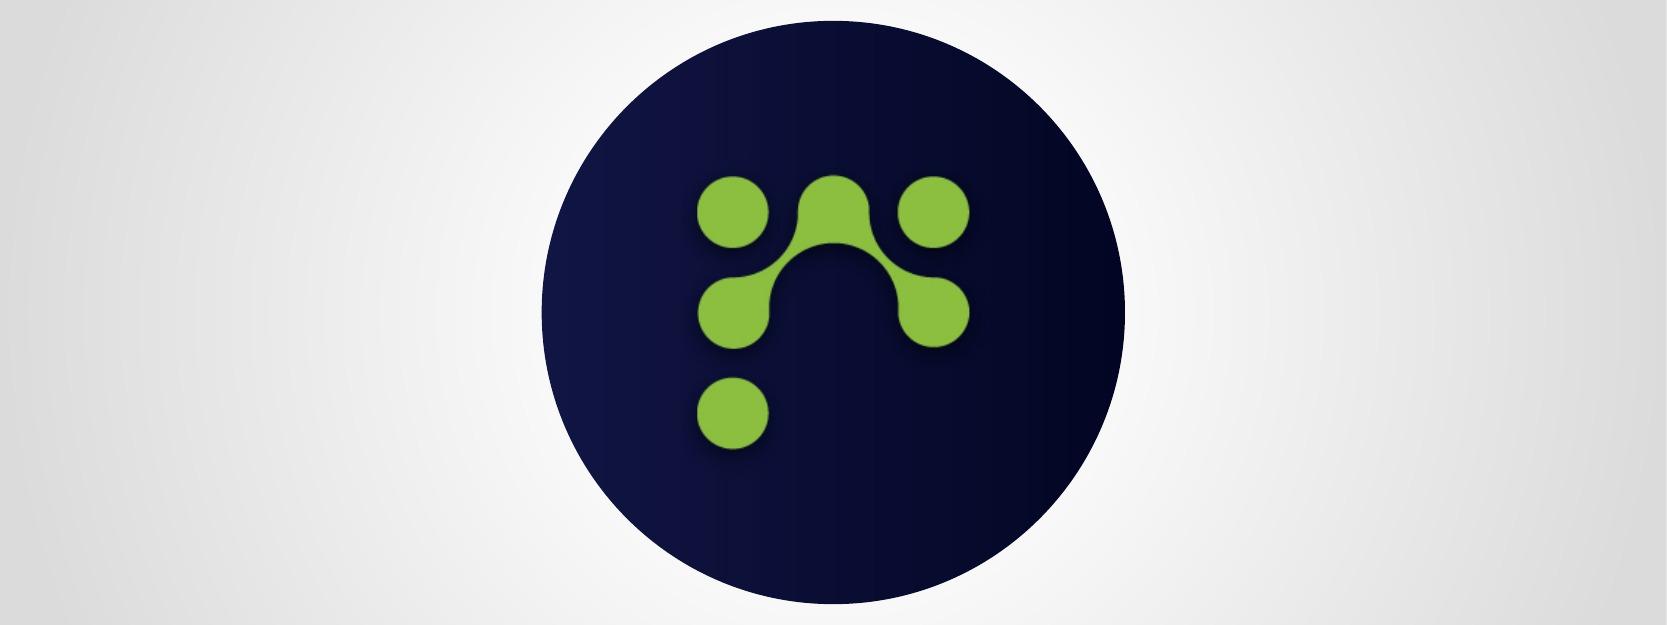 Lucidpress logo - best project management tools